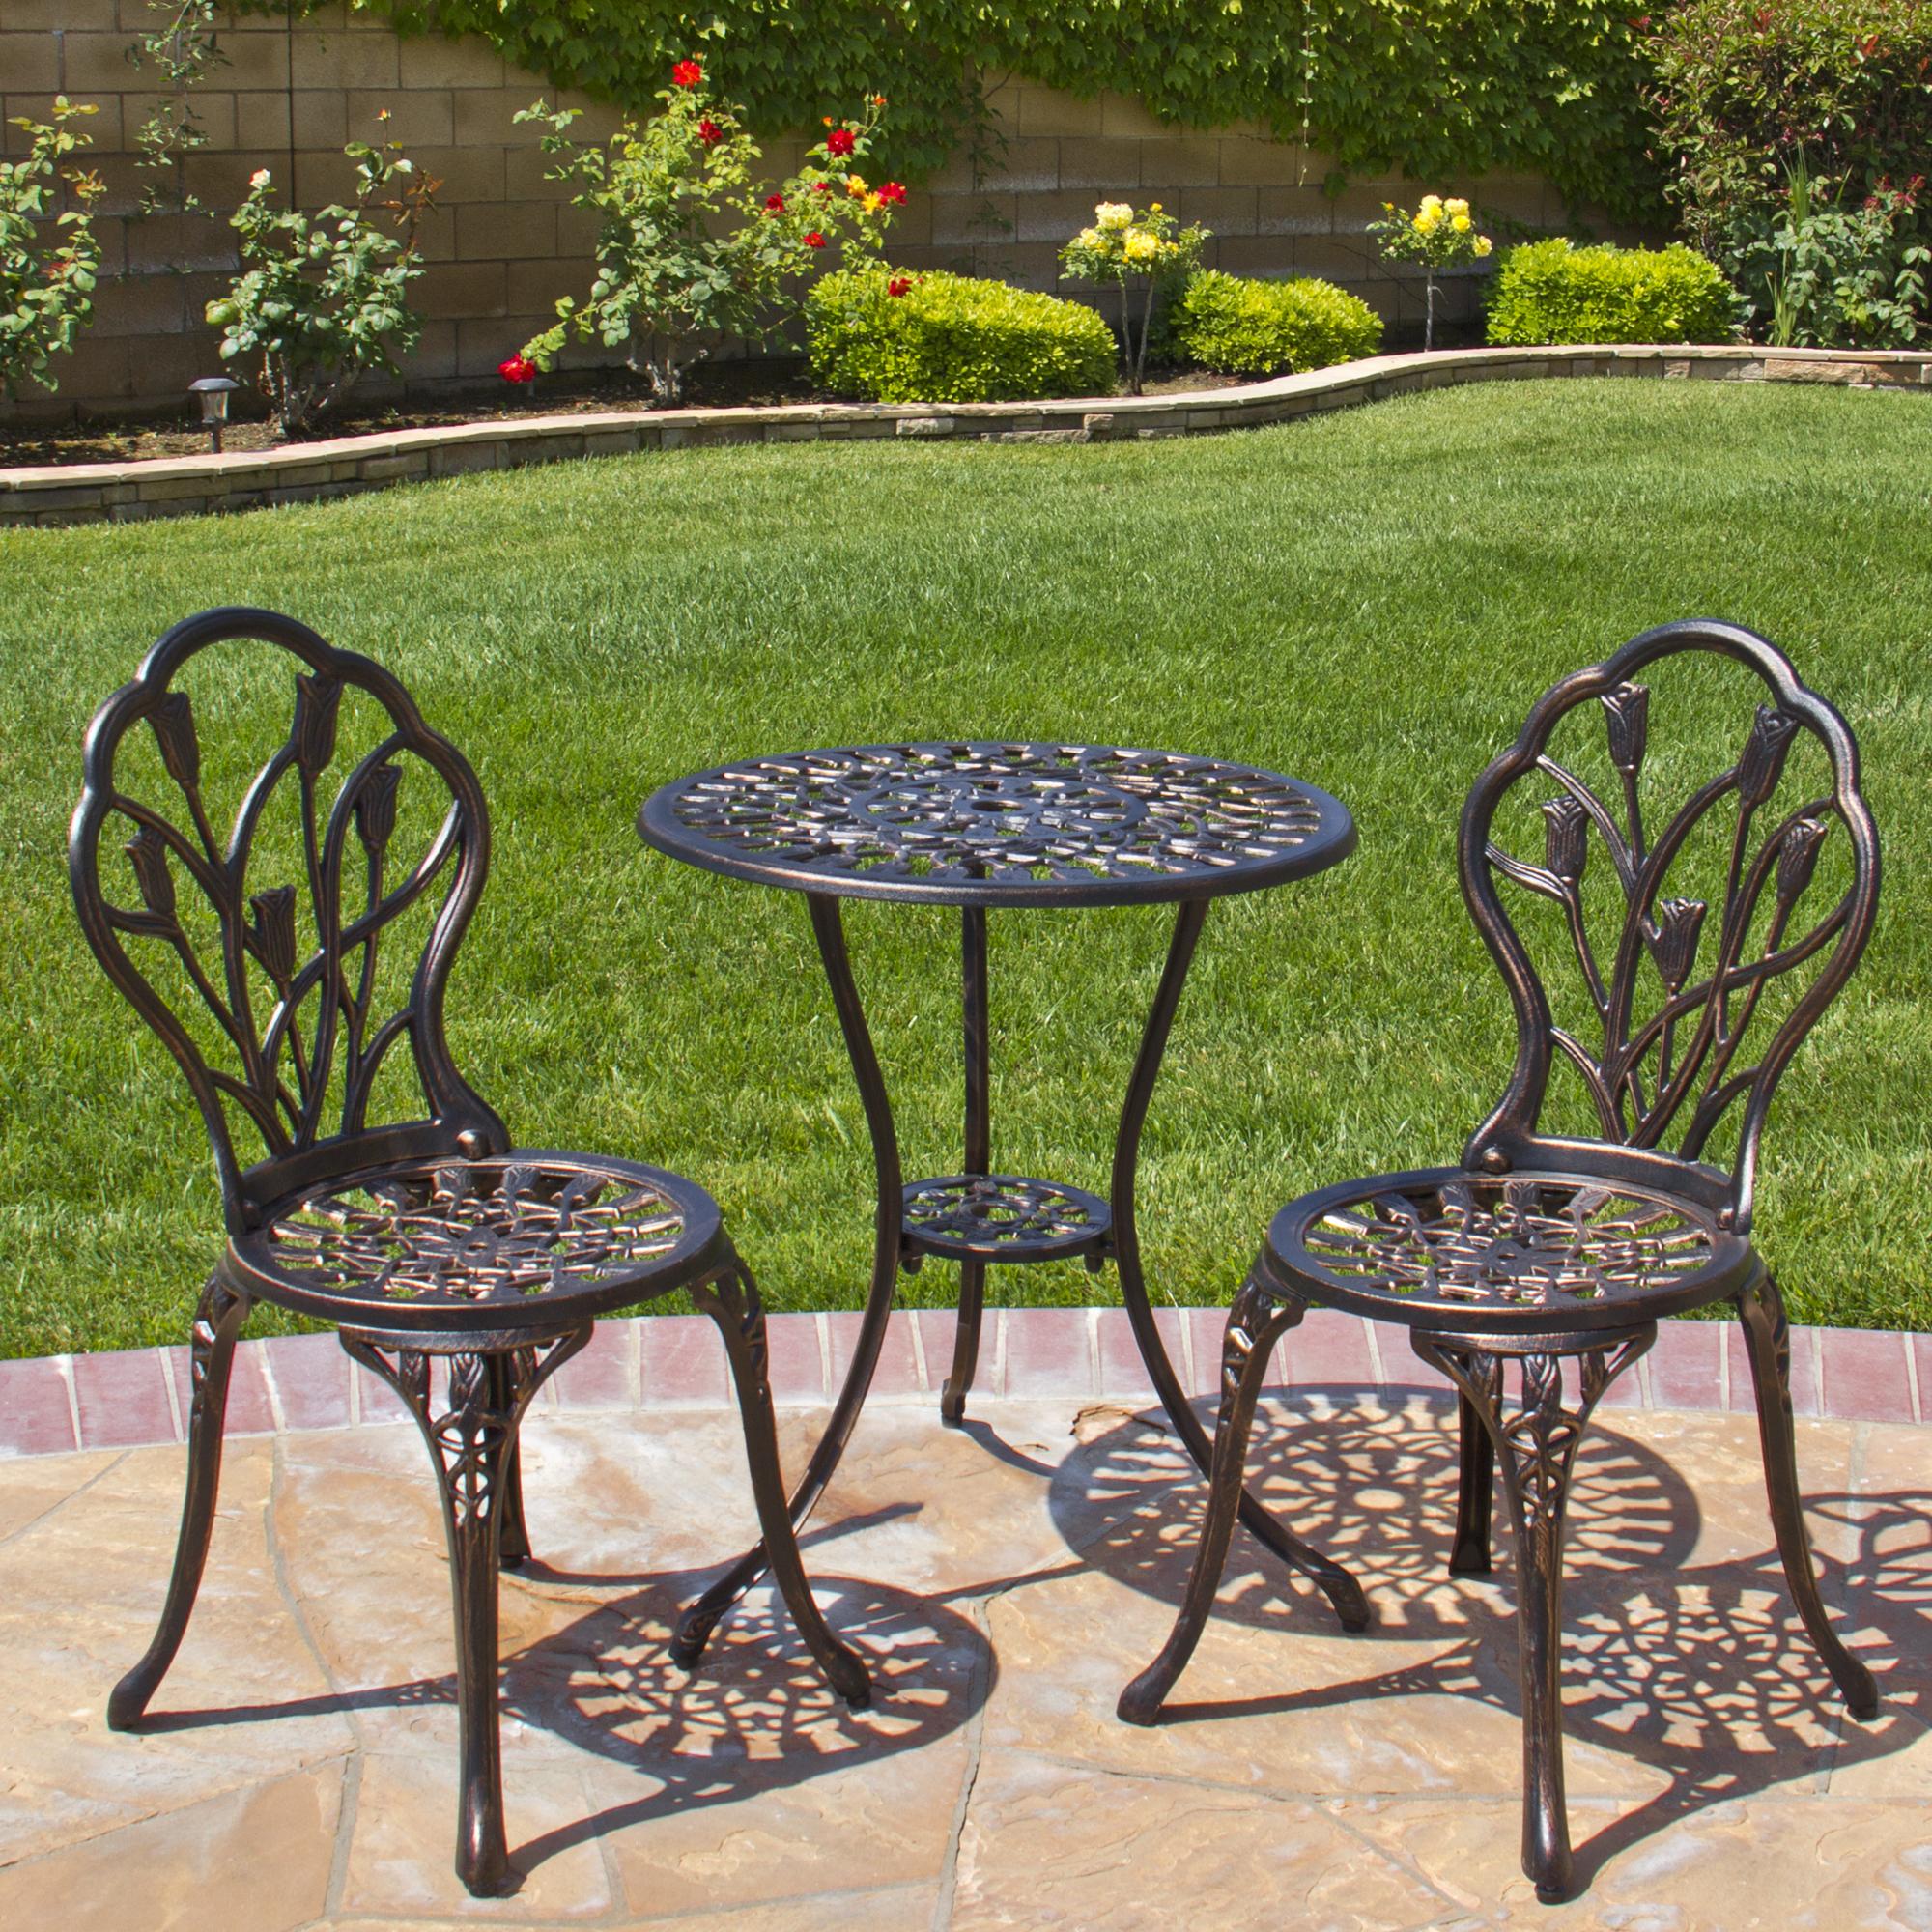 patio bistro set best choice products cast aluminum patio bistro furniture set in antique  copper CHNMDUV